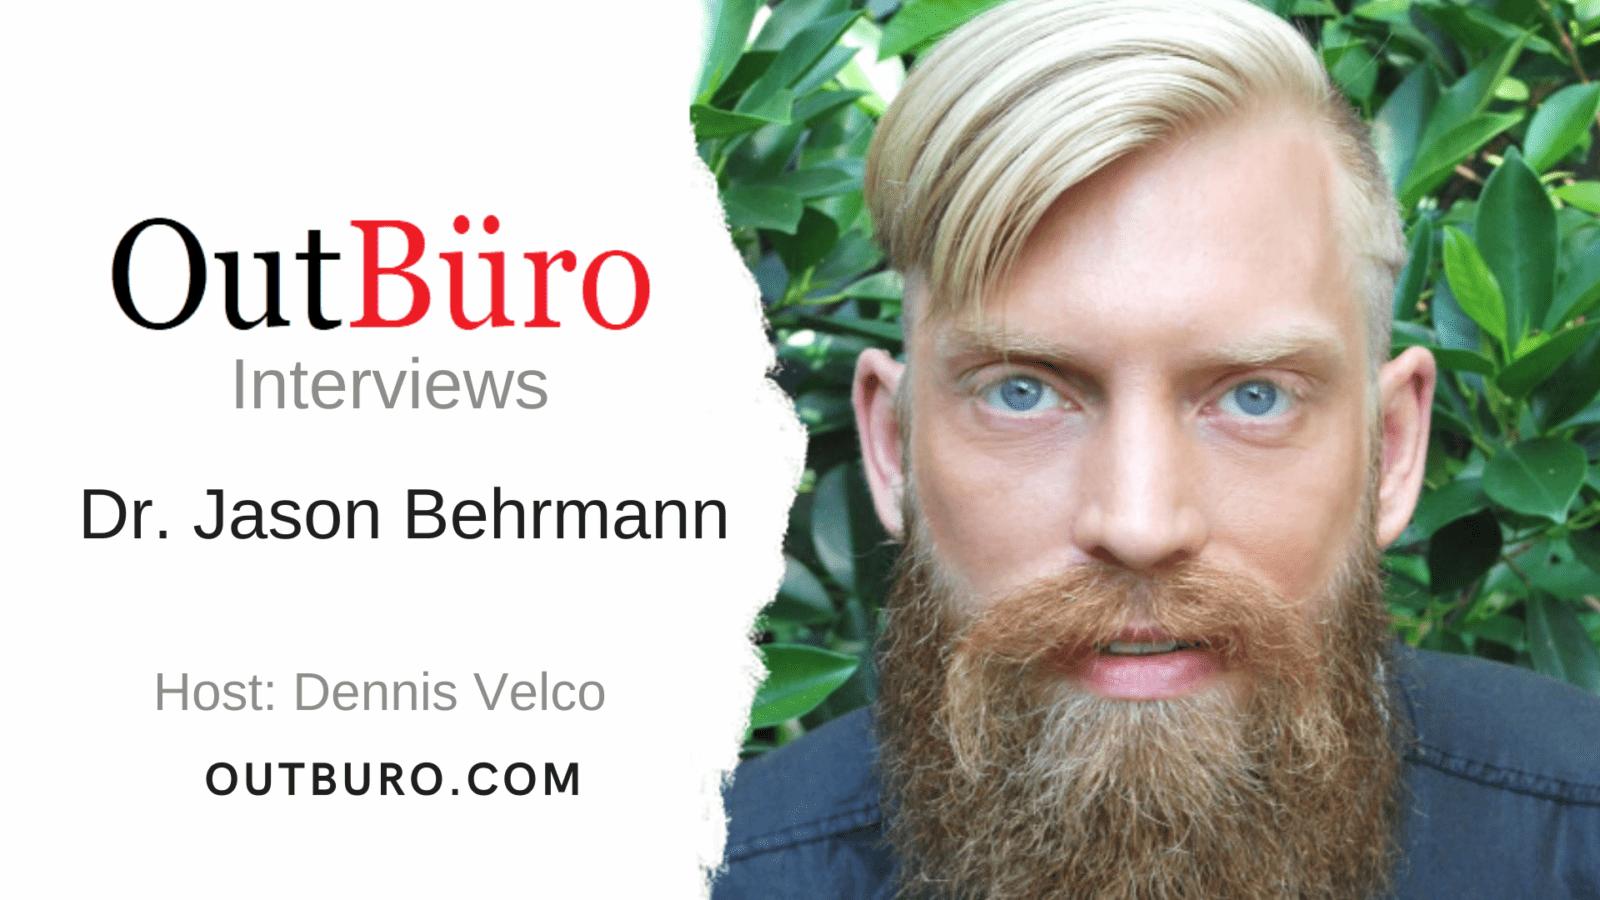 OutBuro Interviews - Dr Jason Behrmann - LGBT Professional Gay Entrepreneur Startup Business Leader LTGBQ Rights Activist Ethics Artificial Intelligence Marketing Strategist